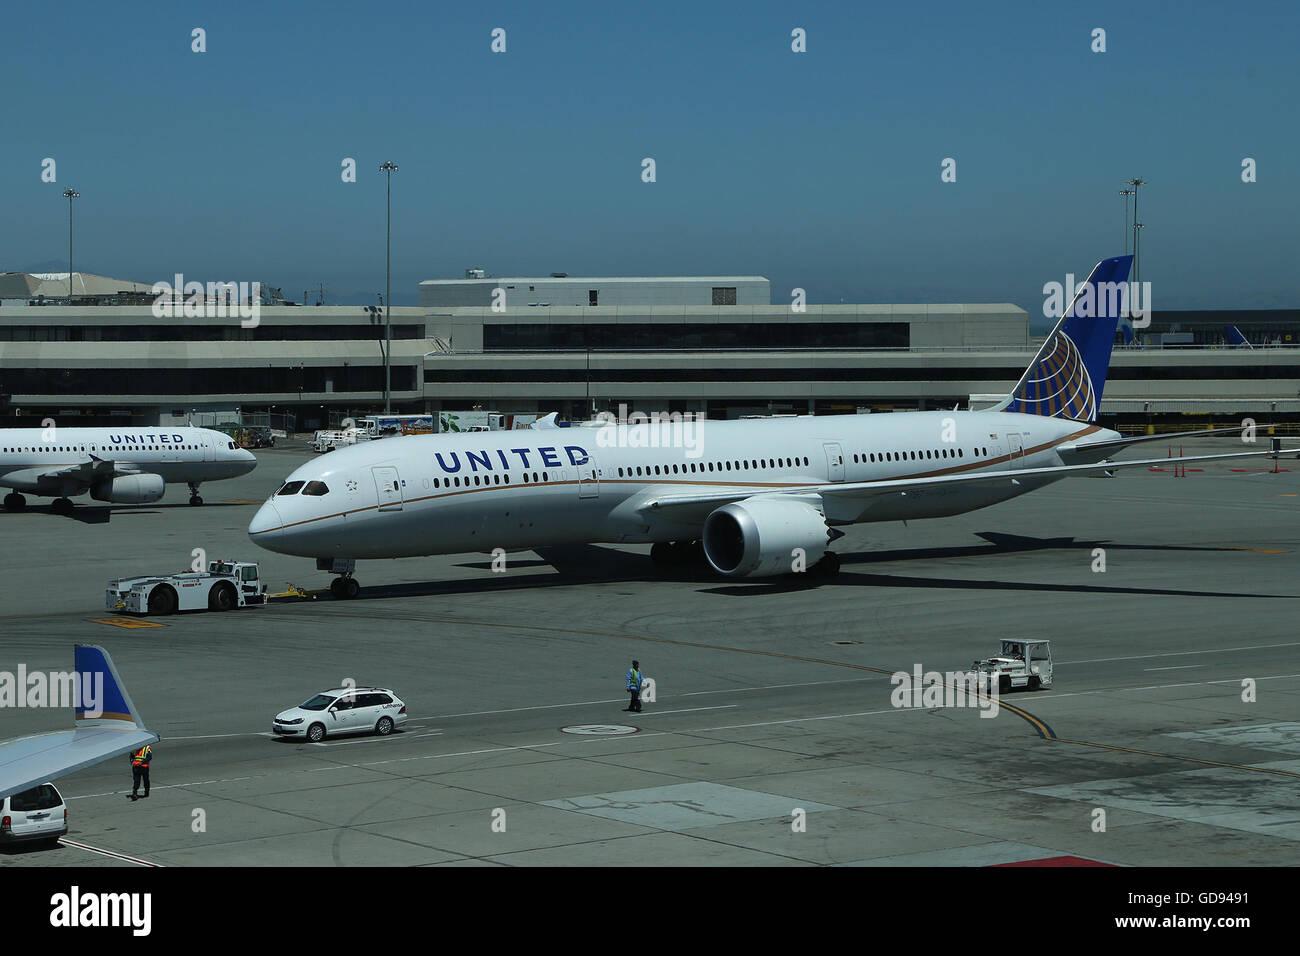 Chinese 787 Dreamliner Stock Photos & Chinese 787 Dreamliner Stock ...